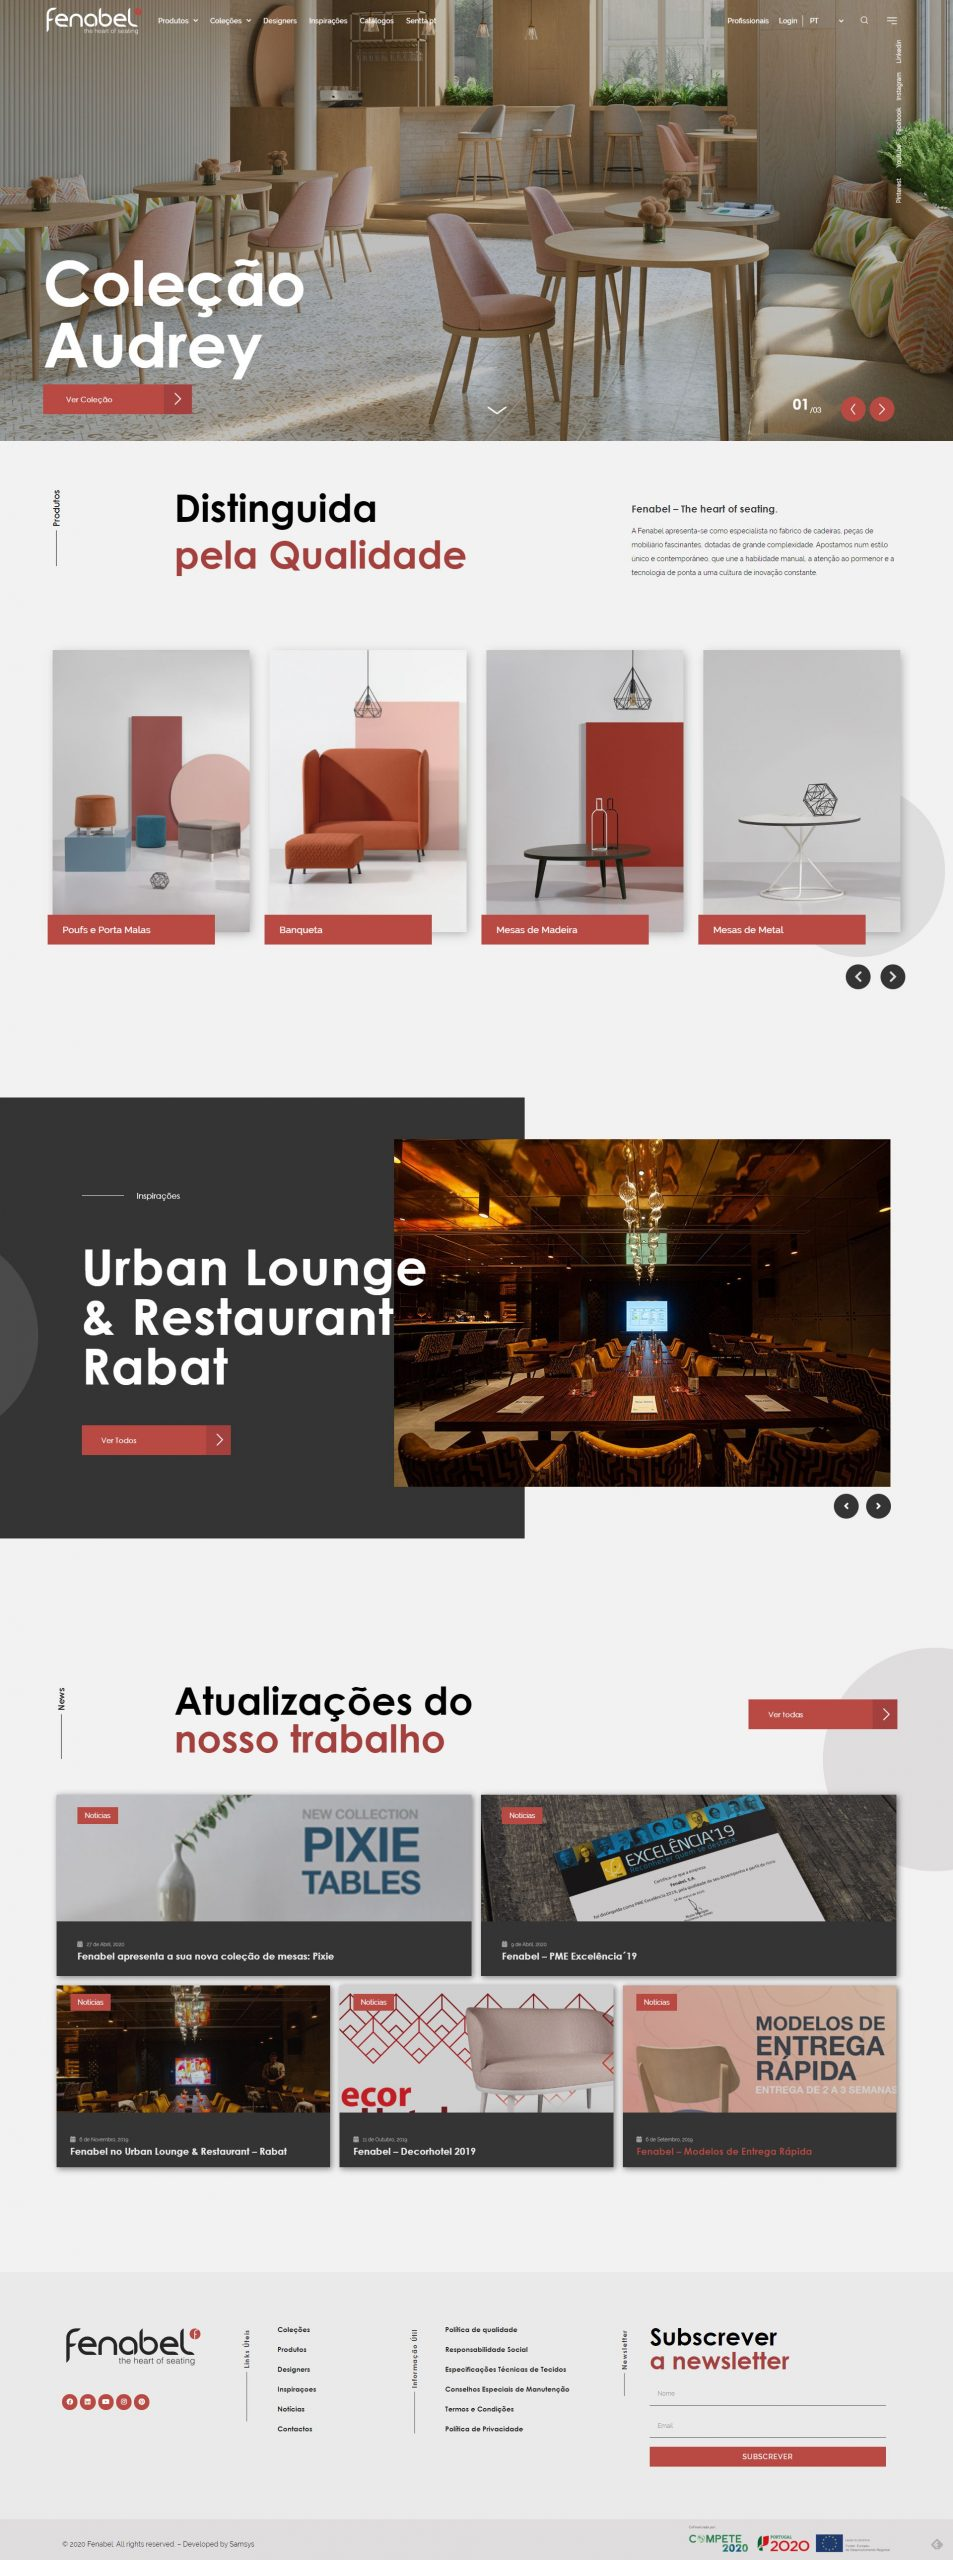 screencapture-fenabel-pt-2020-06-02-10_34_12